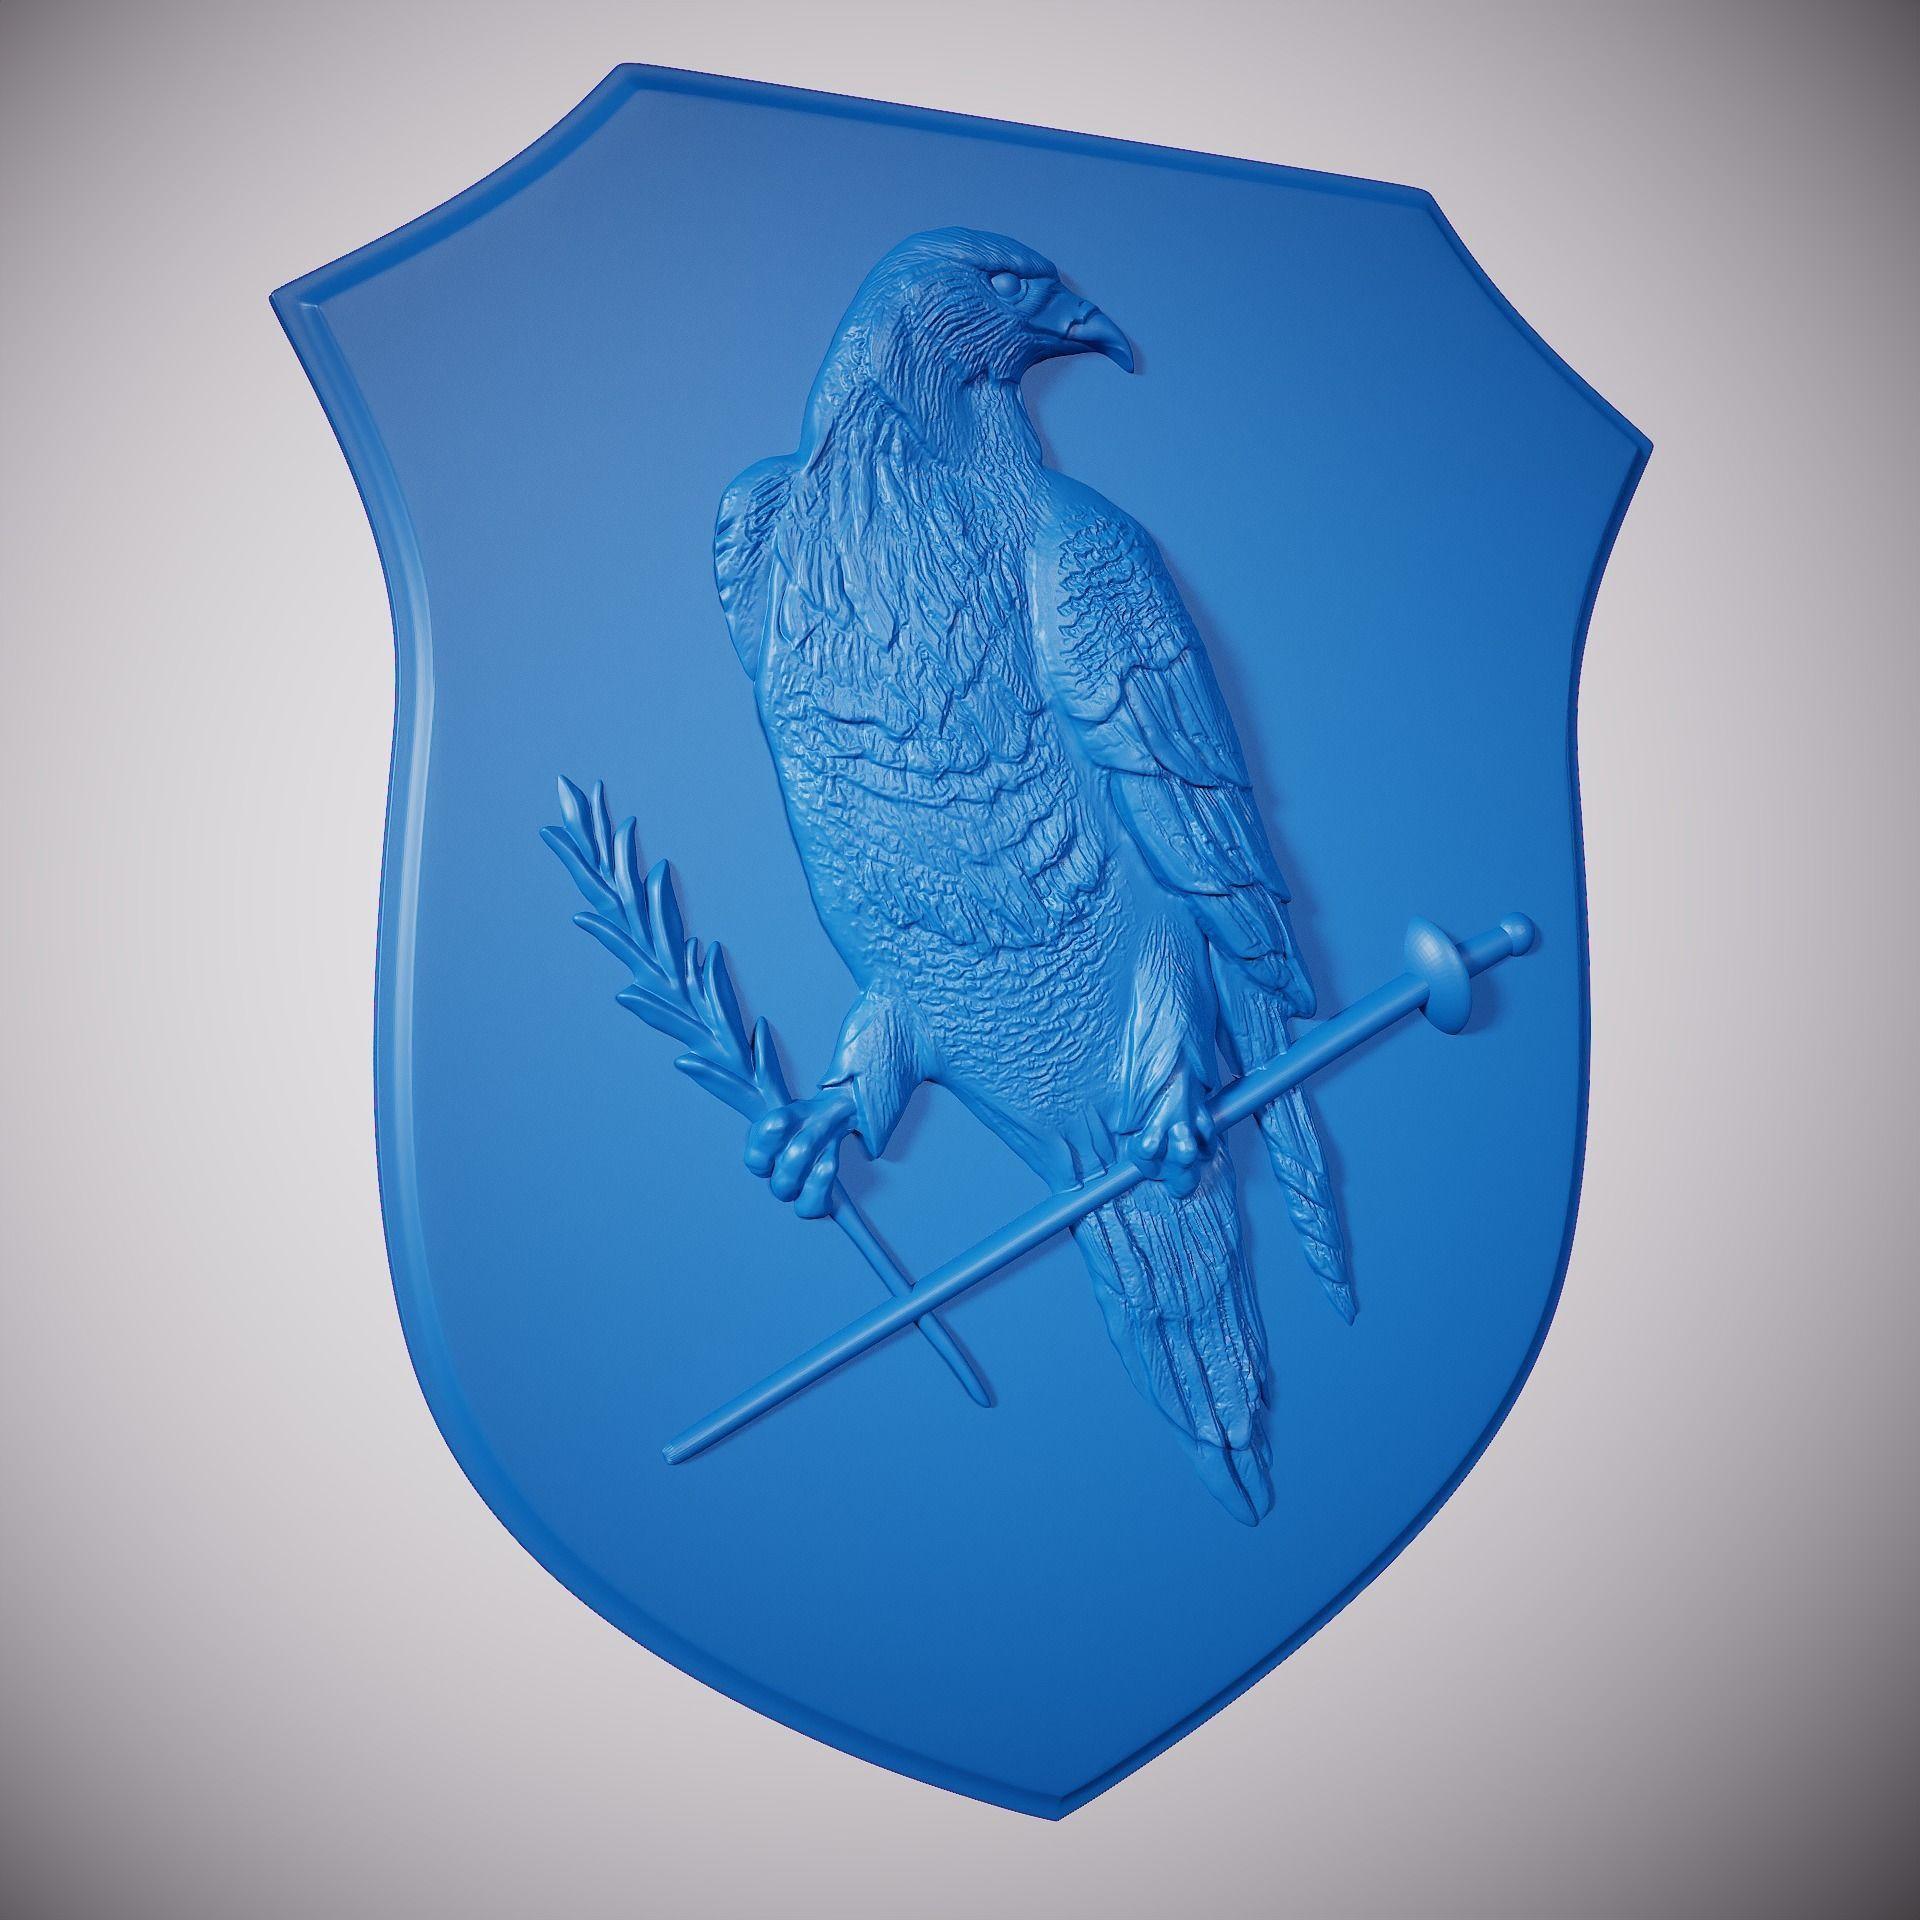 Eagle on the shield